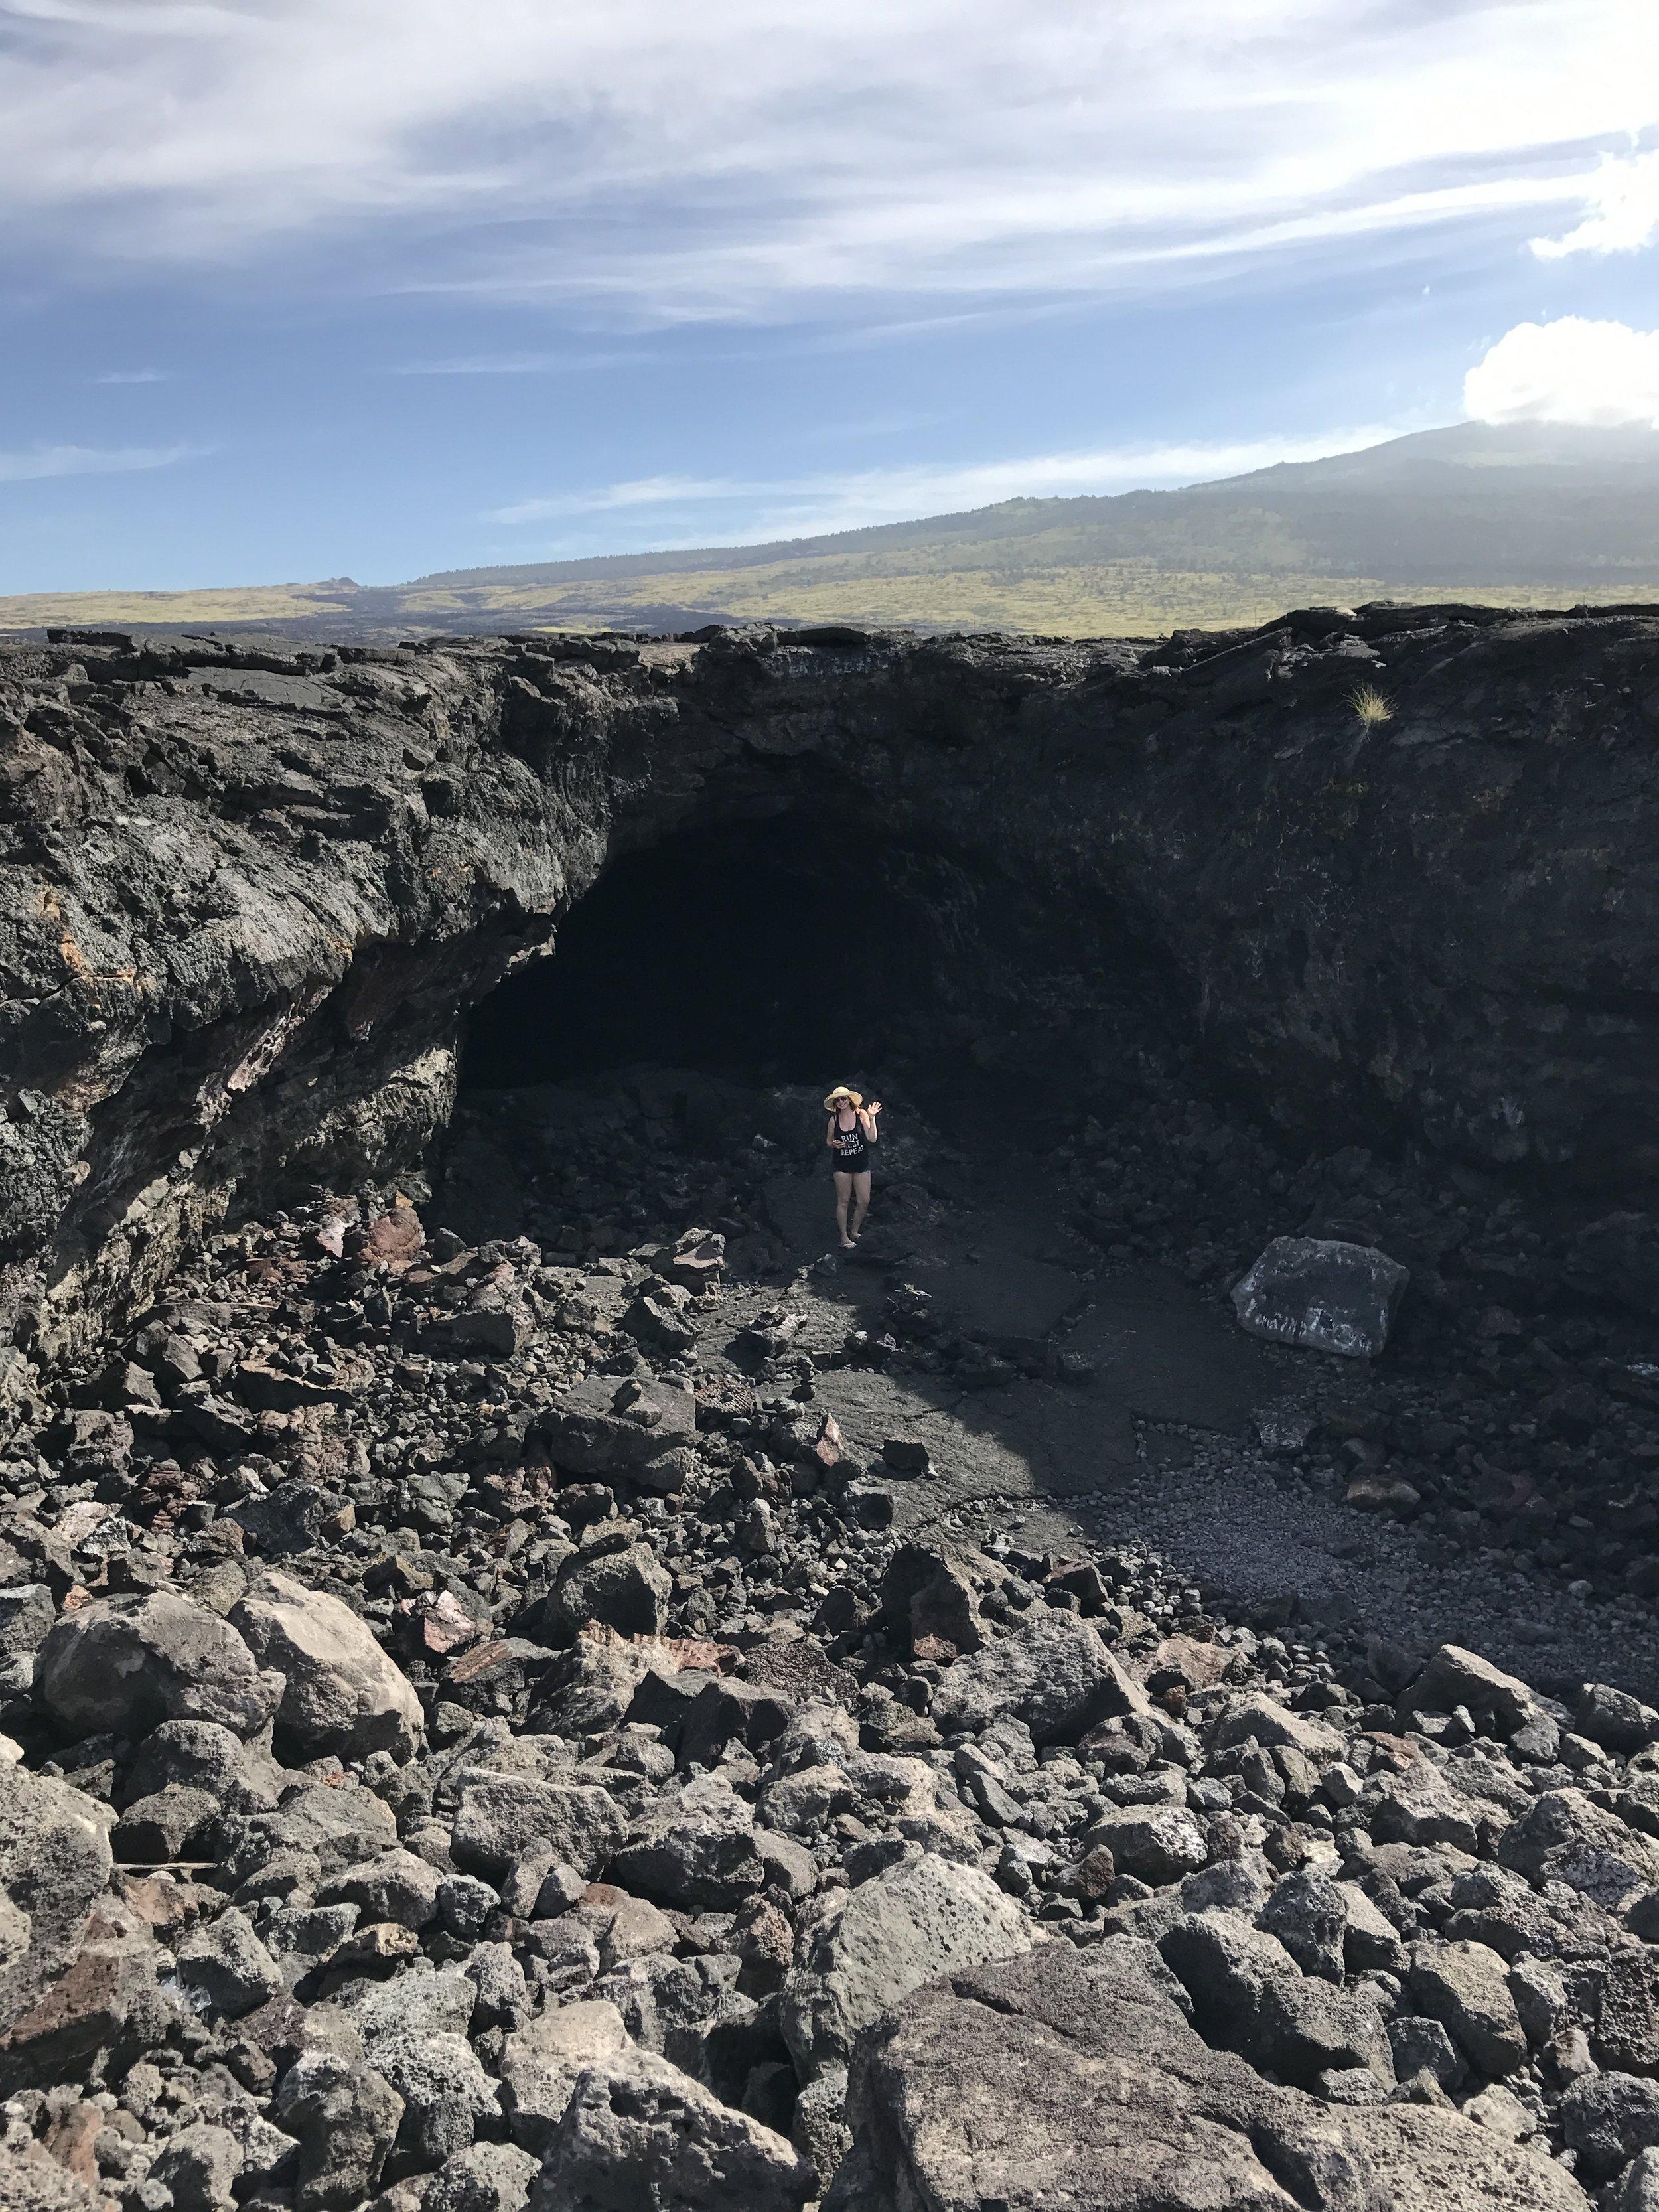 A lava tube in Hawaii